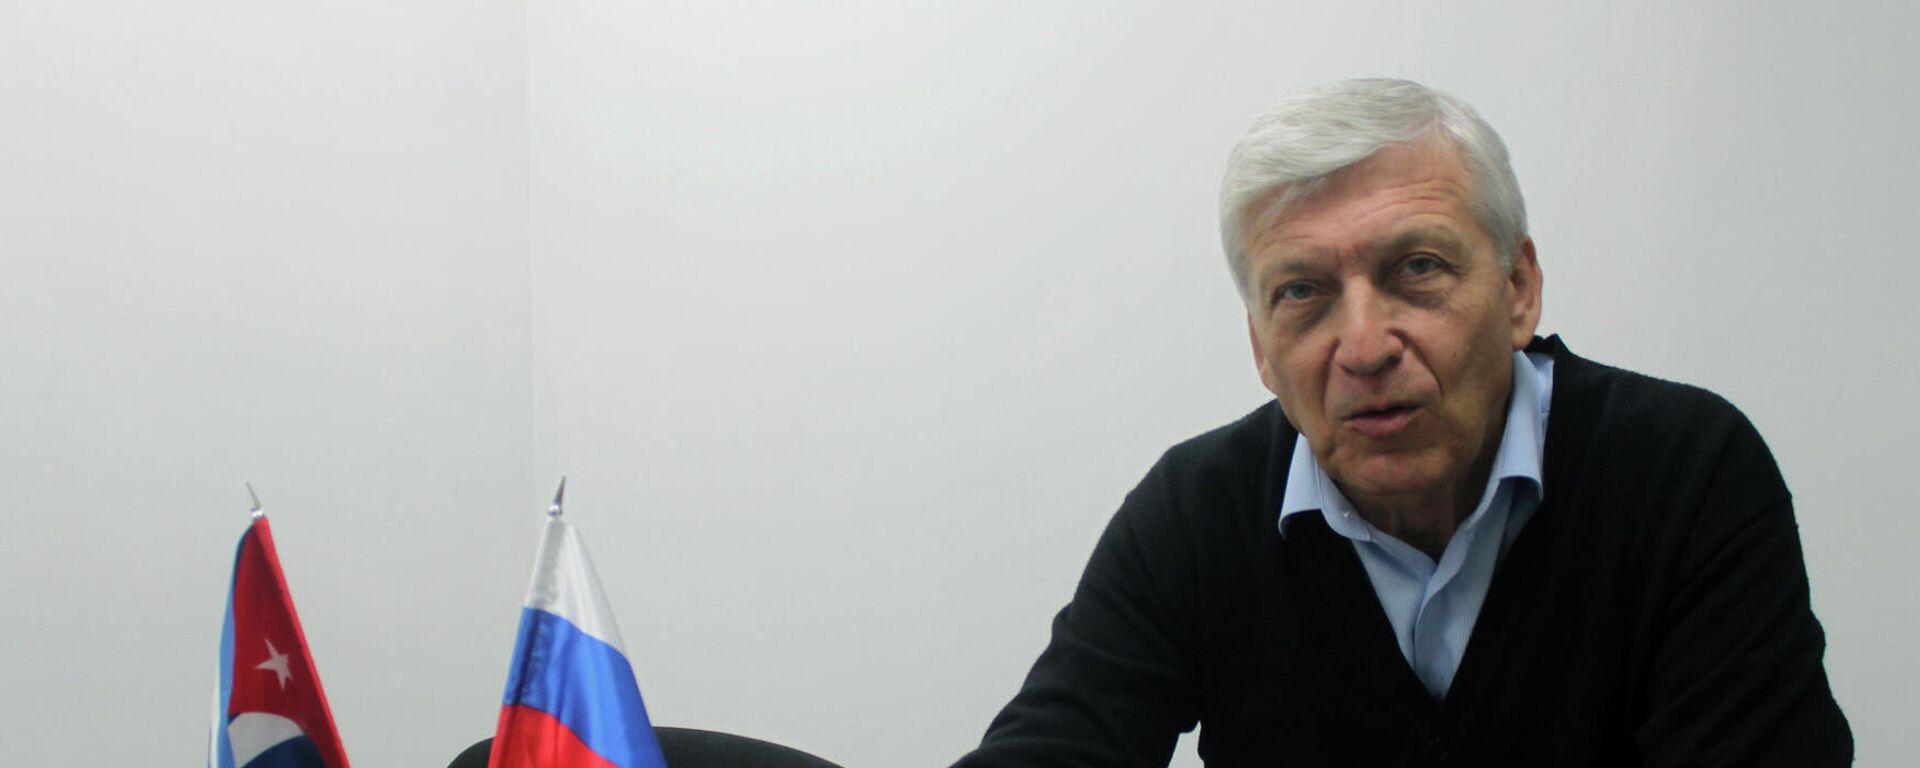 Alexandr Bogatir, representante comercial ruso en Cuba - Sputnik Mundo, 1920, 08.04.2021